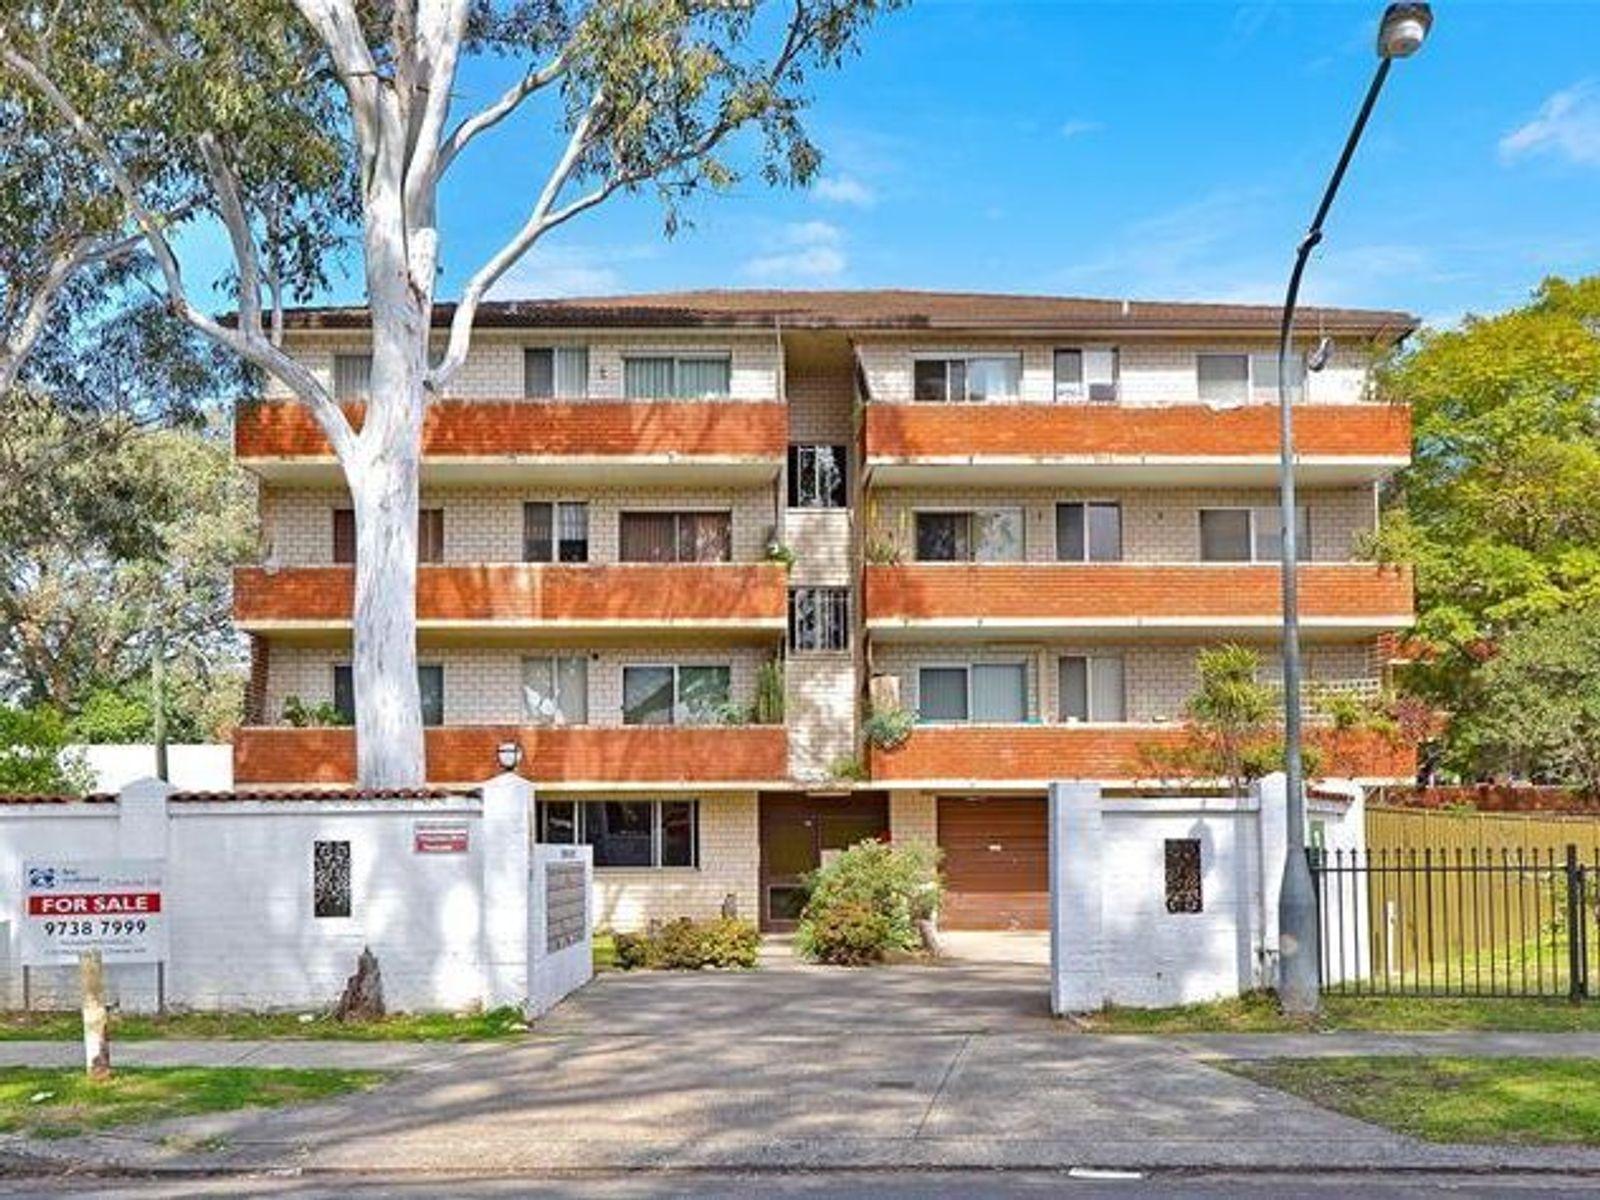 24/1 Waterside Crescent, Carramar, NSW 2163